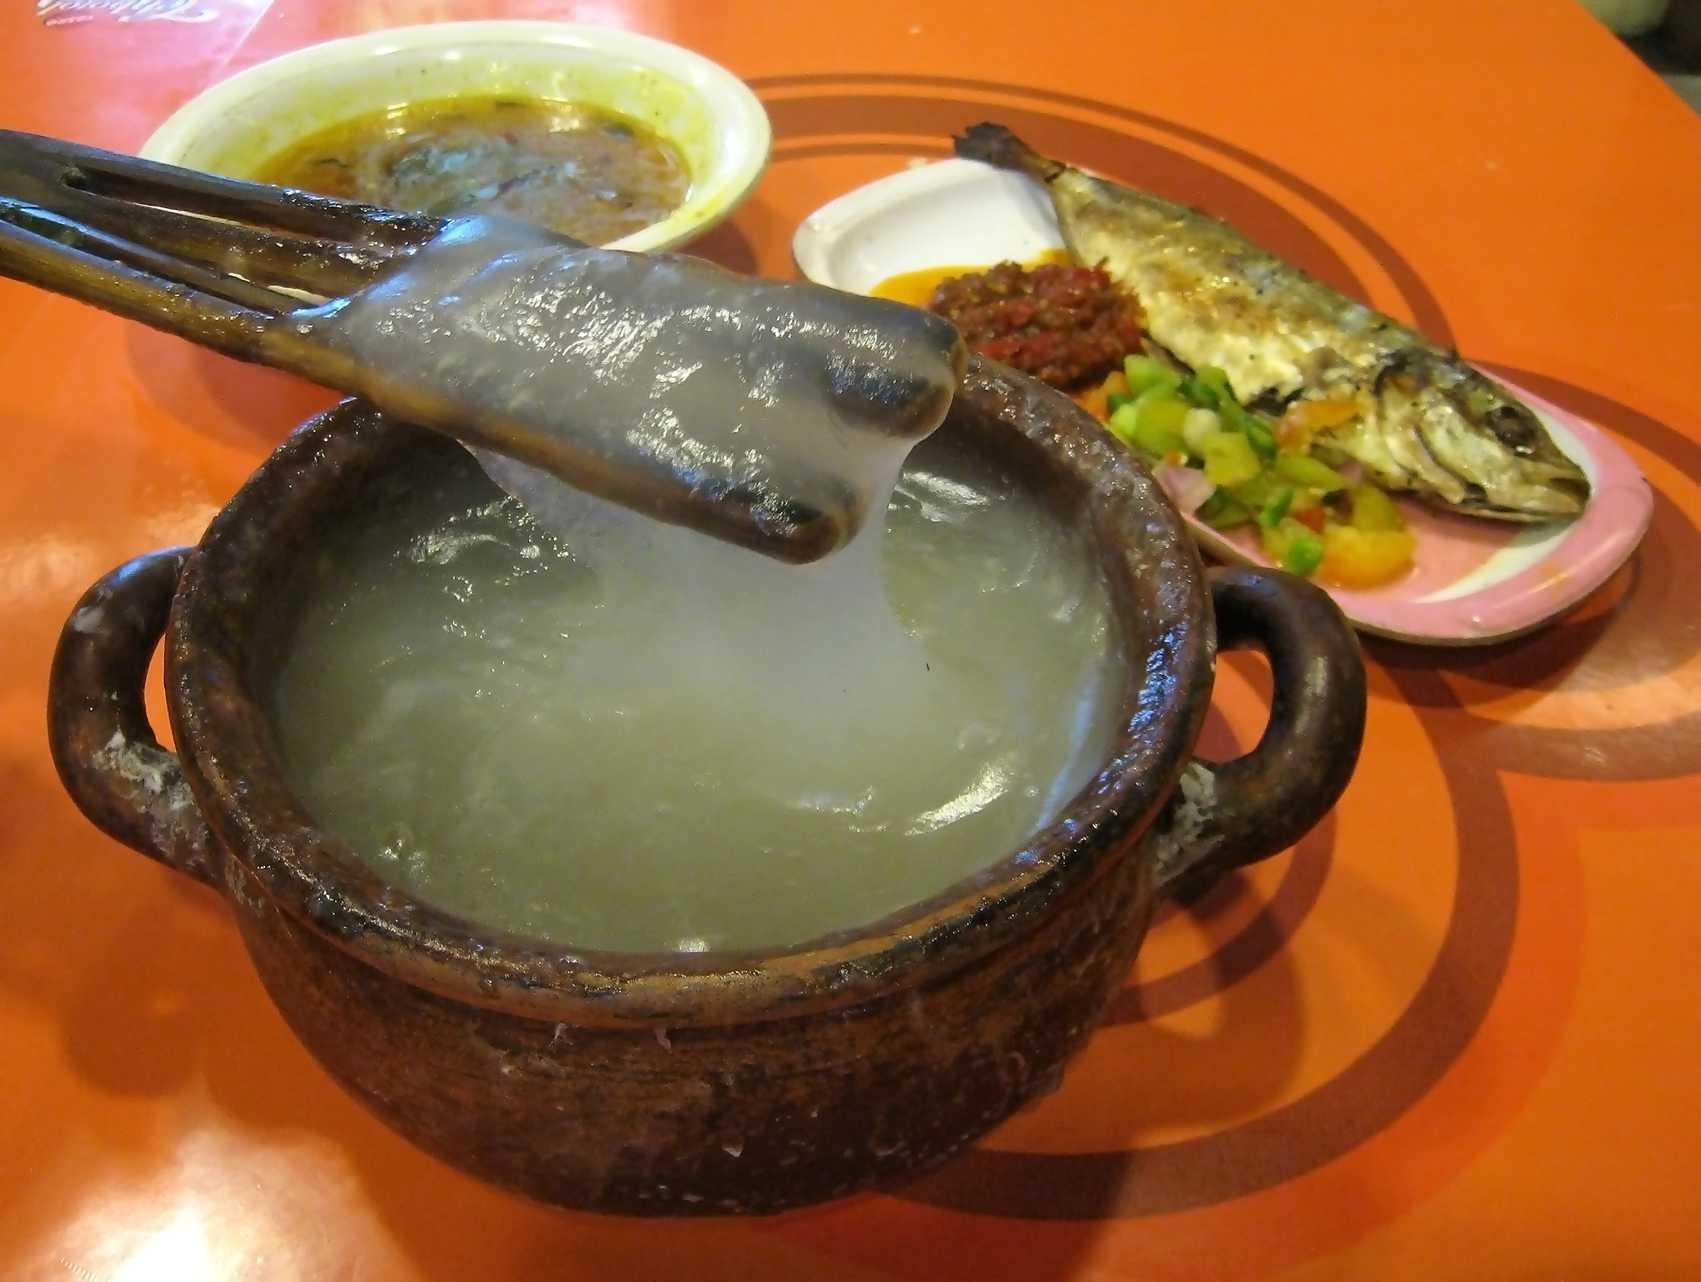 Resep Bubur Pisang Ikan Kenari Khas Ambon